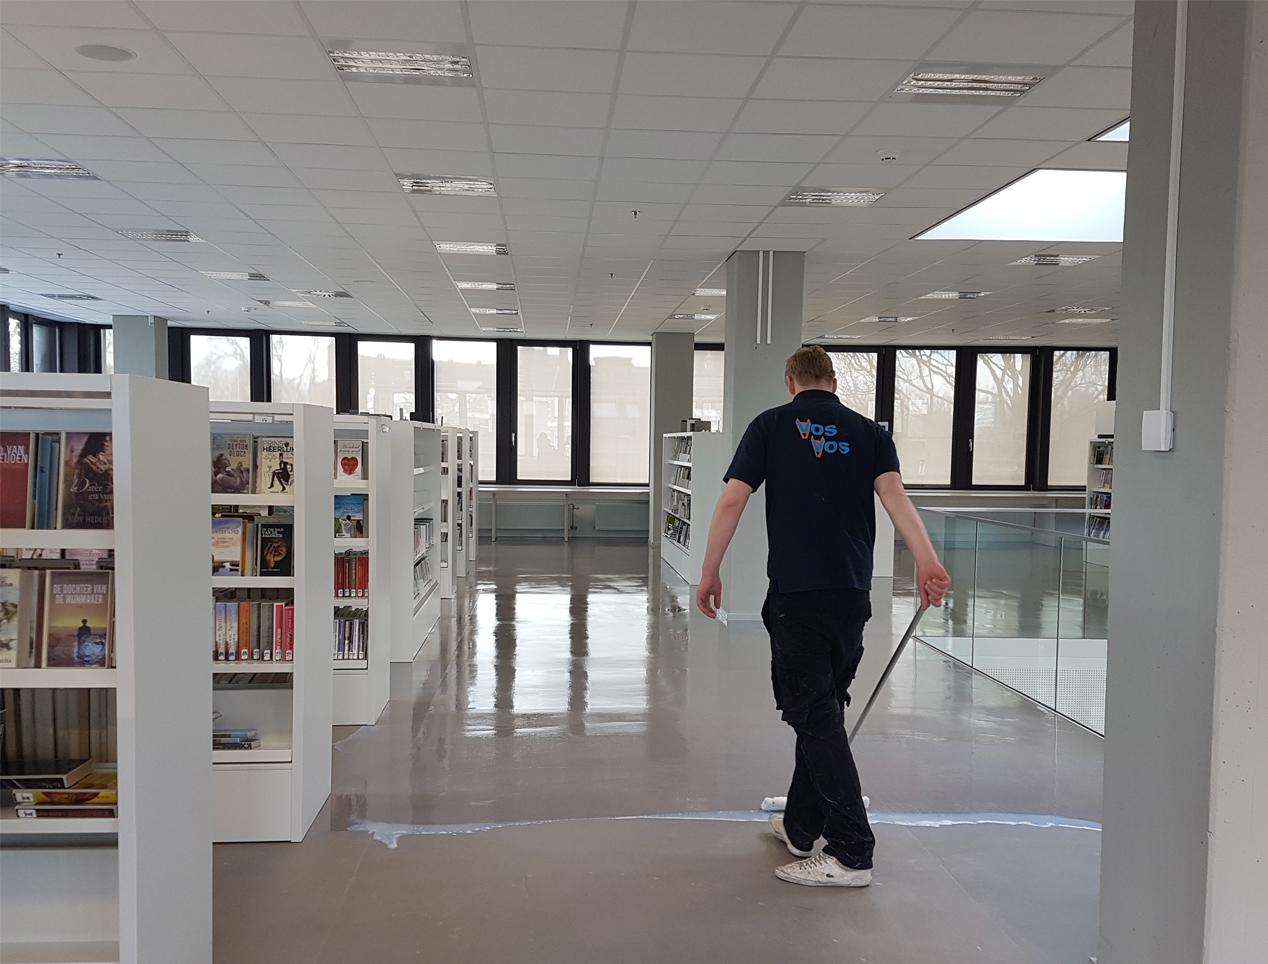 schoonmaak bibliotheek zwolle